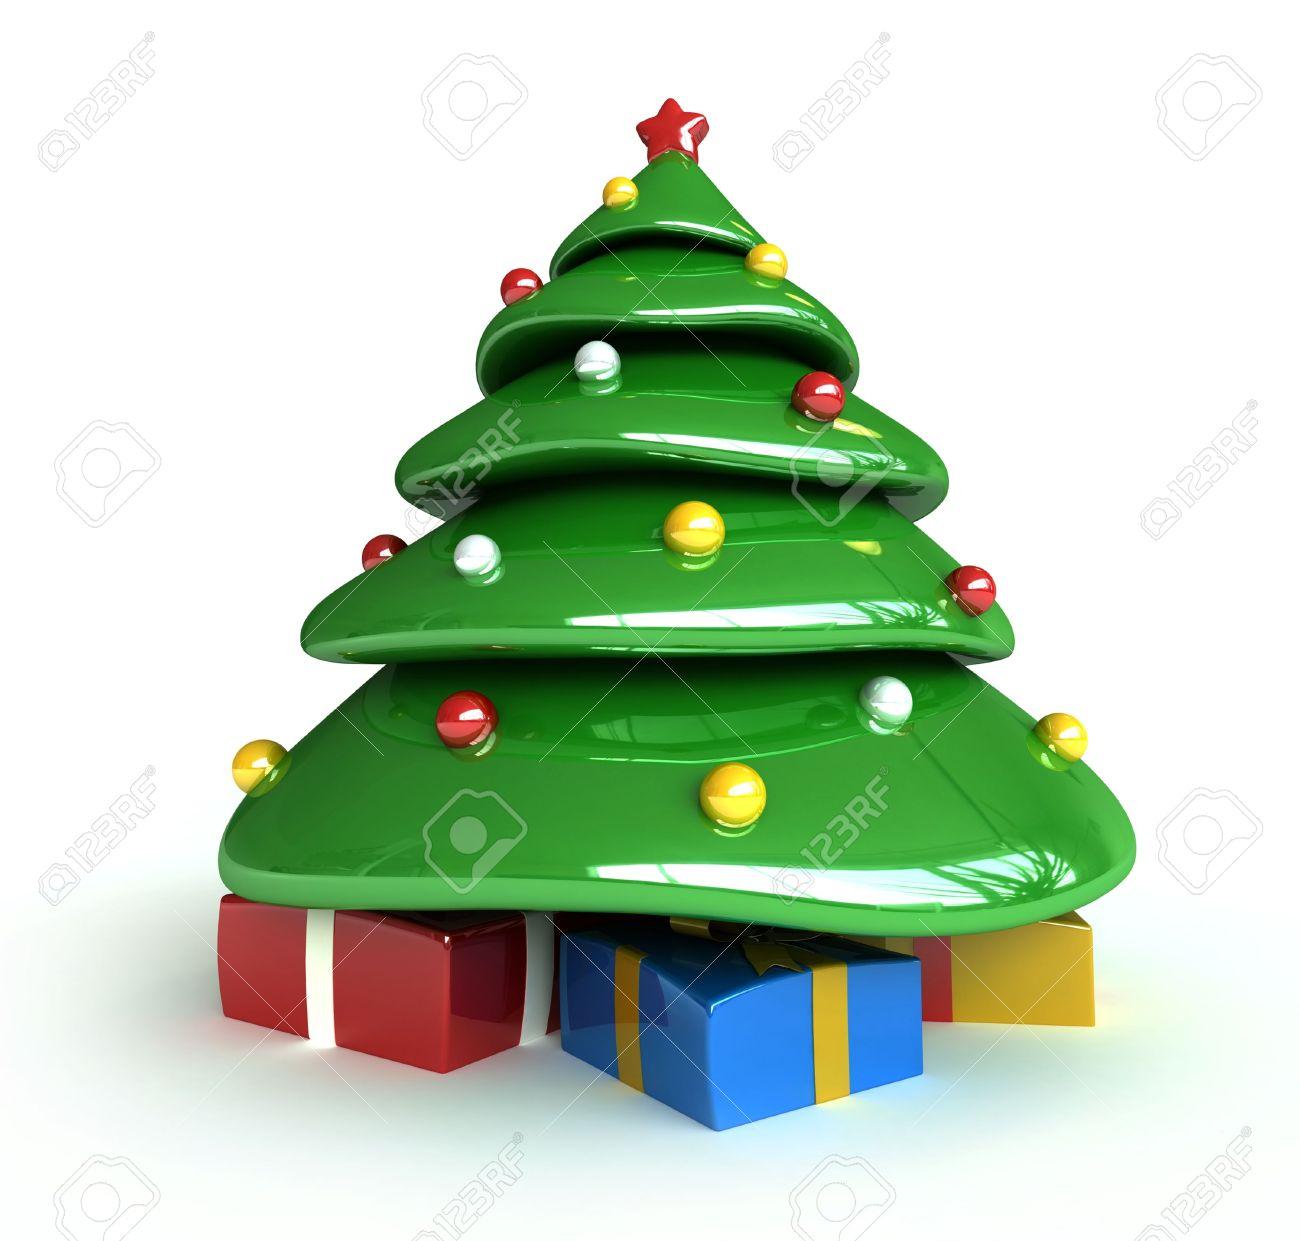 3d Christmas Tree.3d Render Of Christmas Tree Cartoon Style